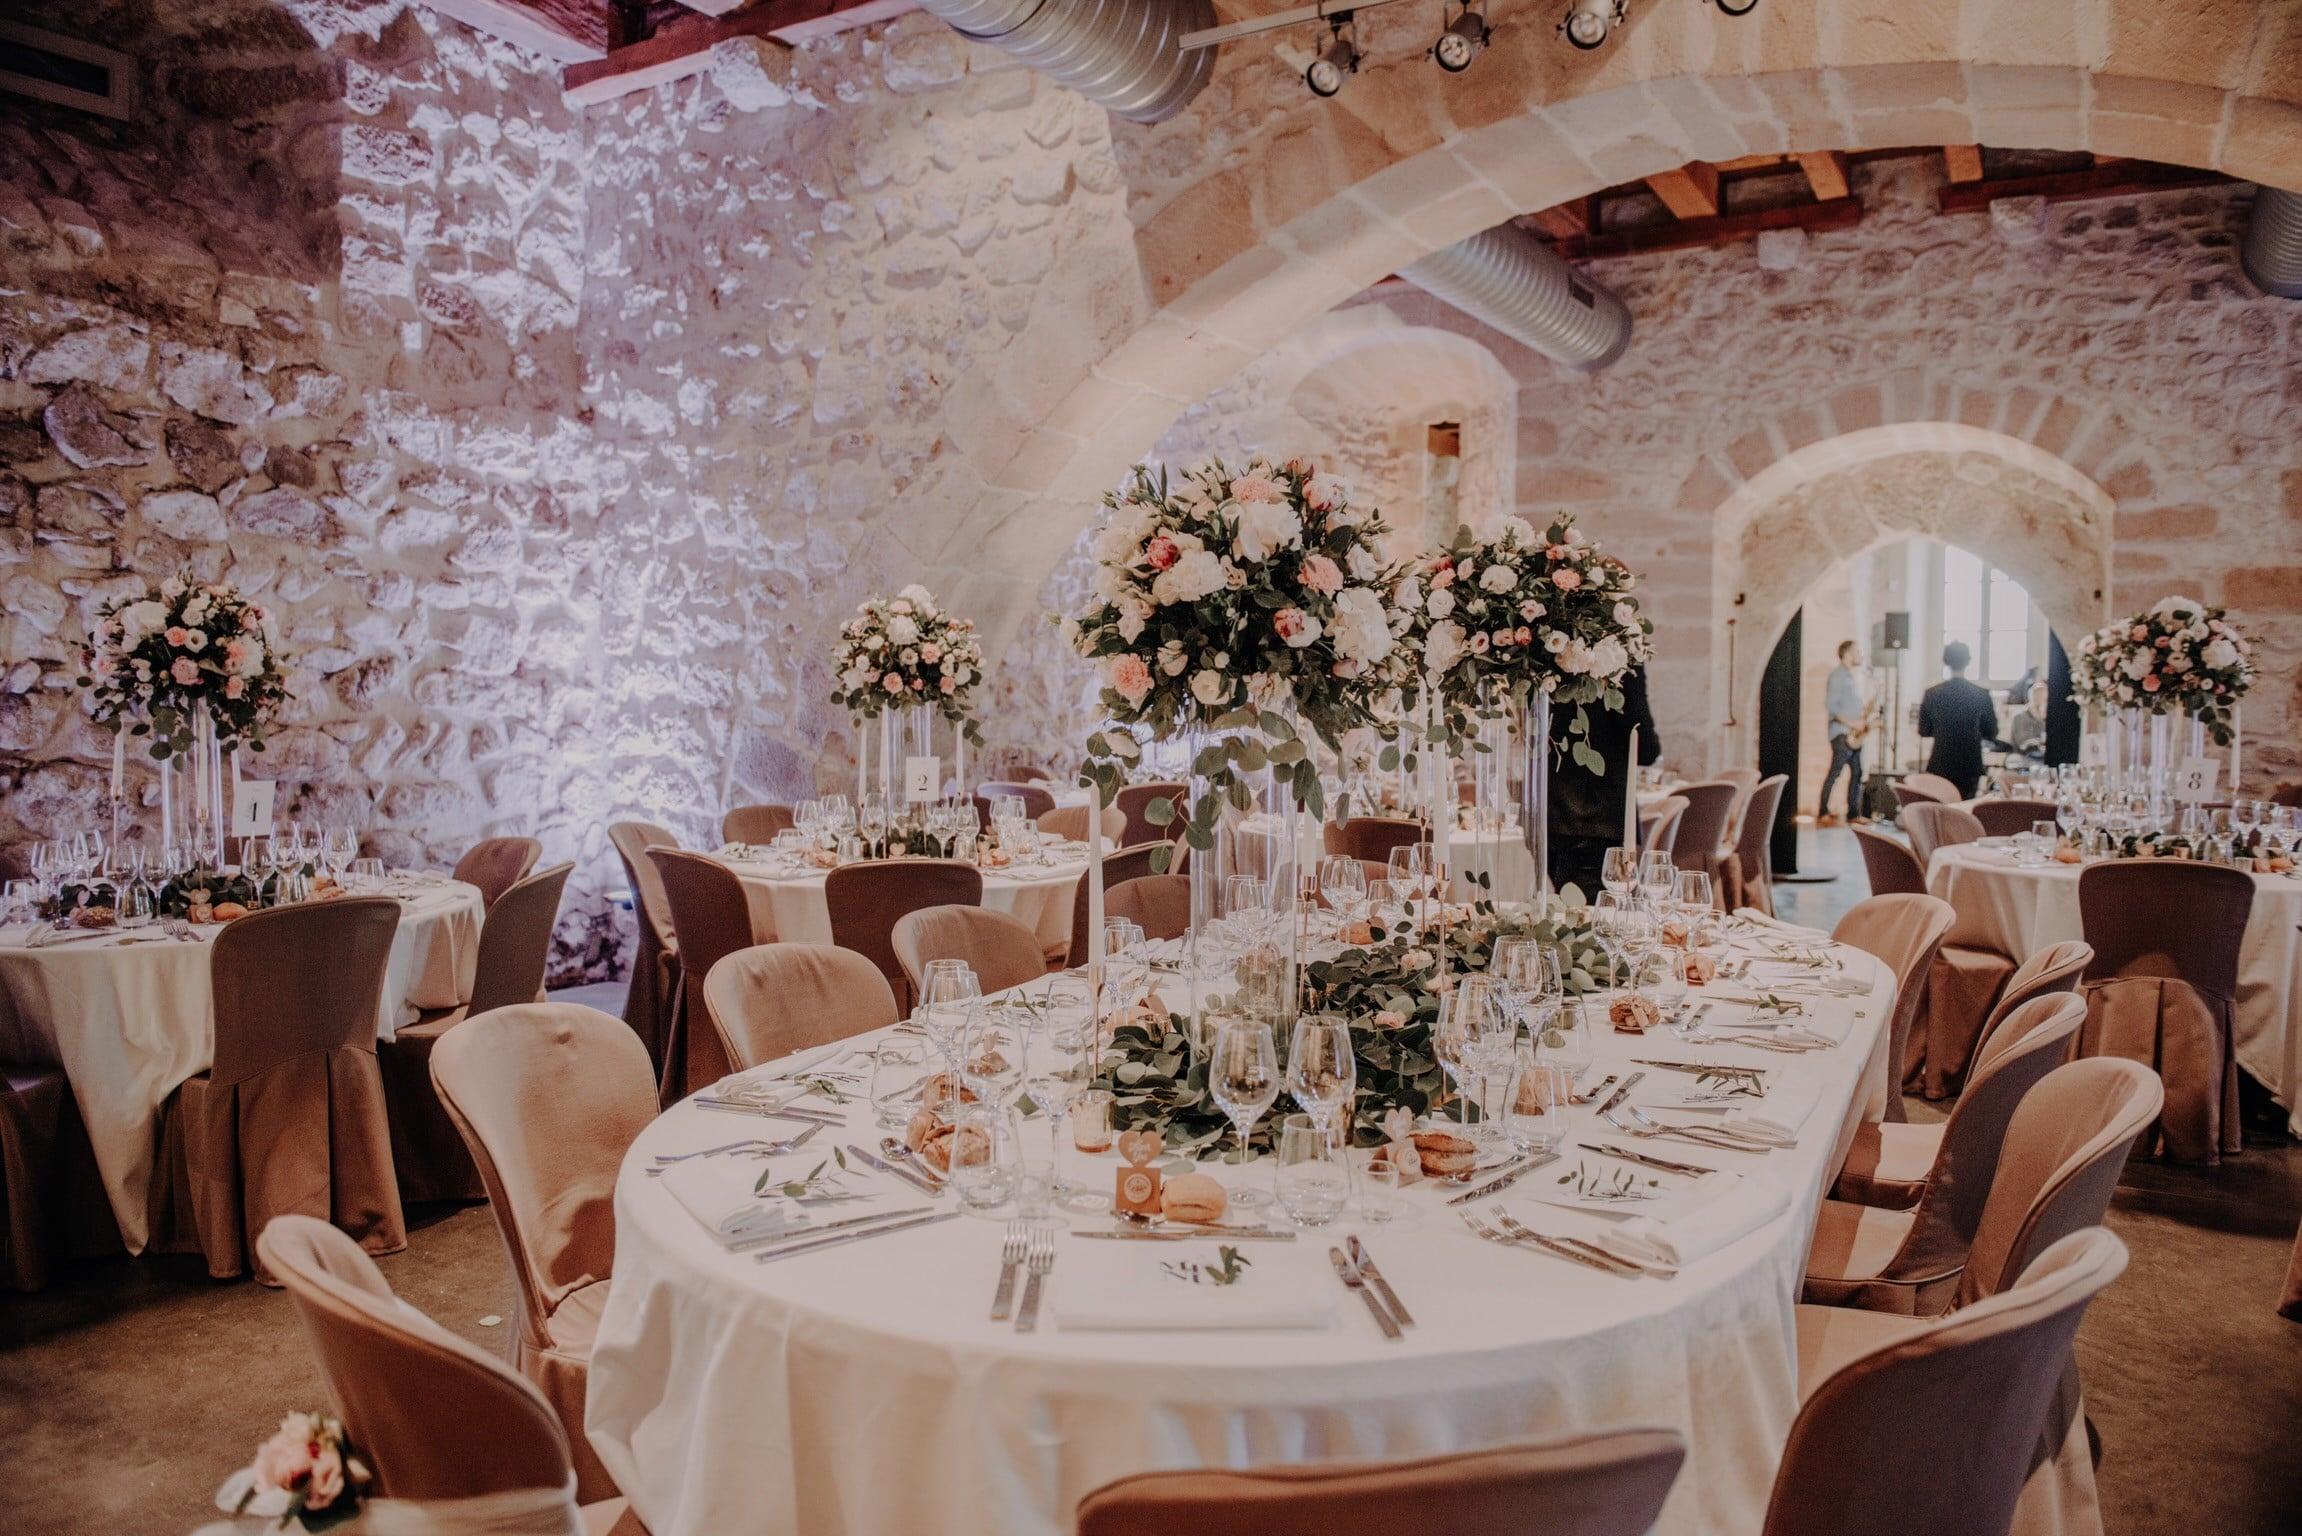 Mariage de Tomoris & Florent